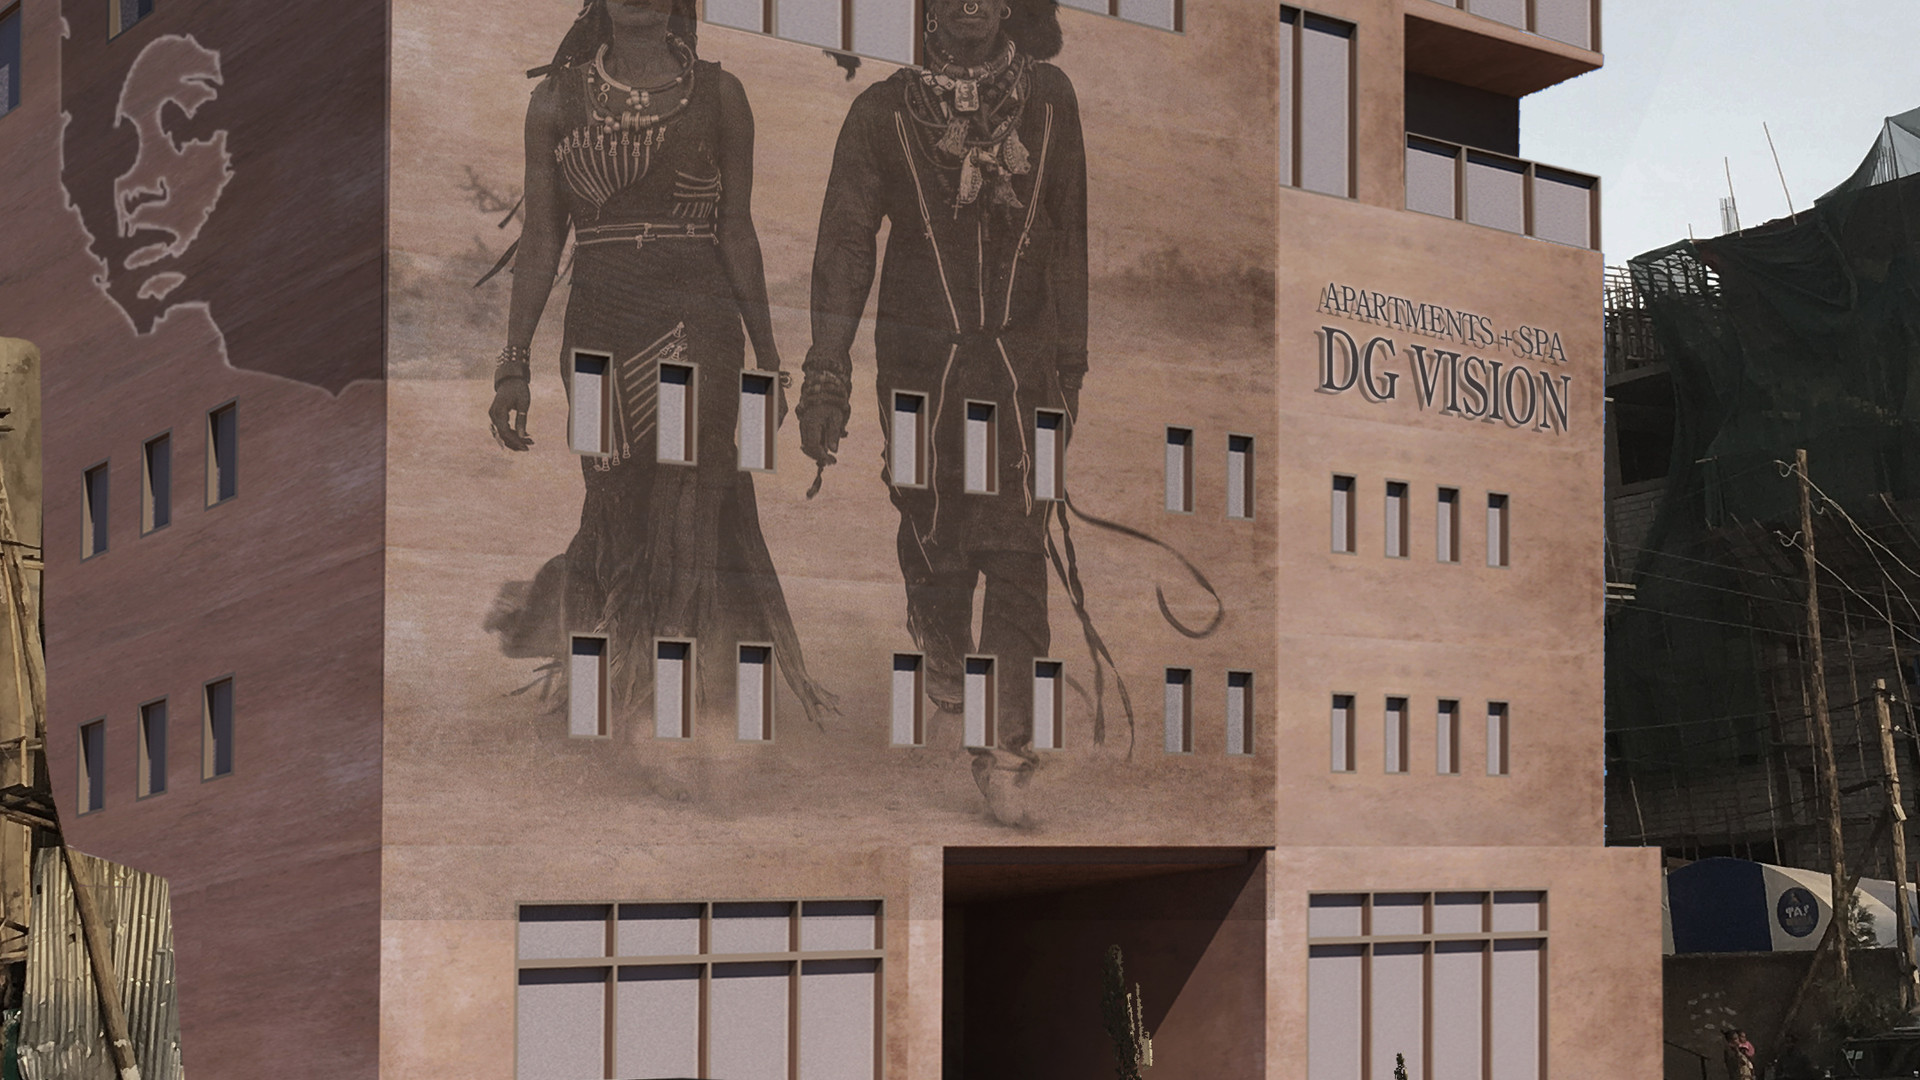 DG VISION - SPA AND APARTMENTS